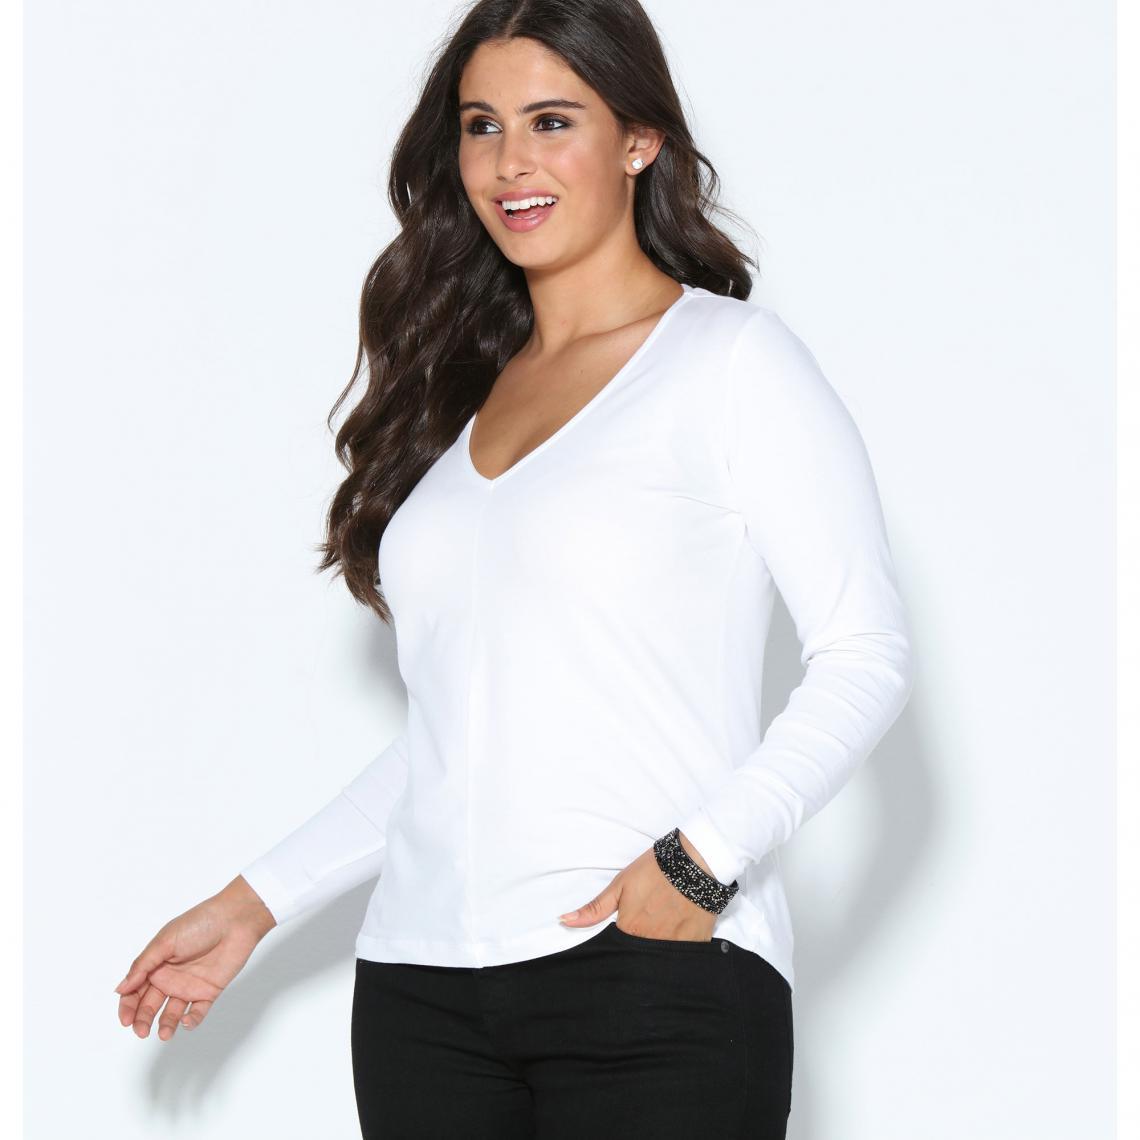 6f245cd6863 Tee-shirt manches longues col en V femme - Blanc 3 SUISSES Femme